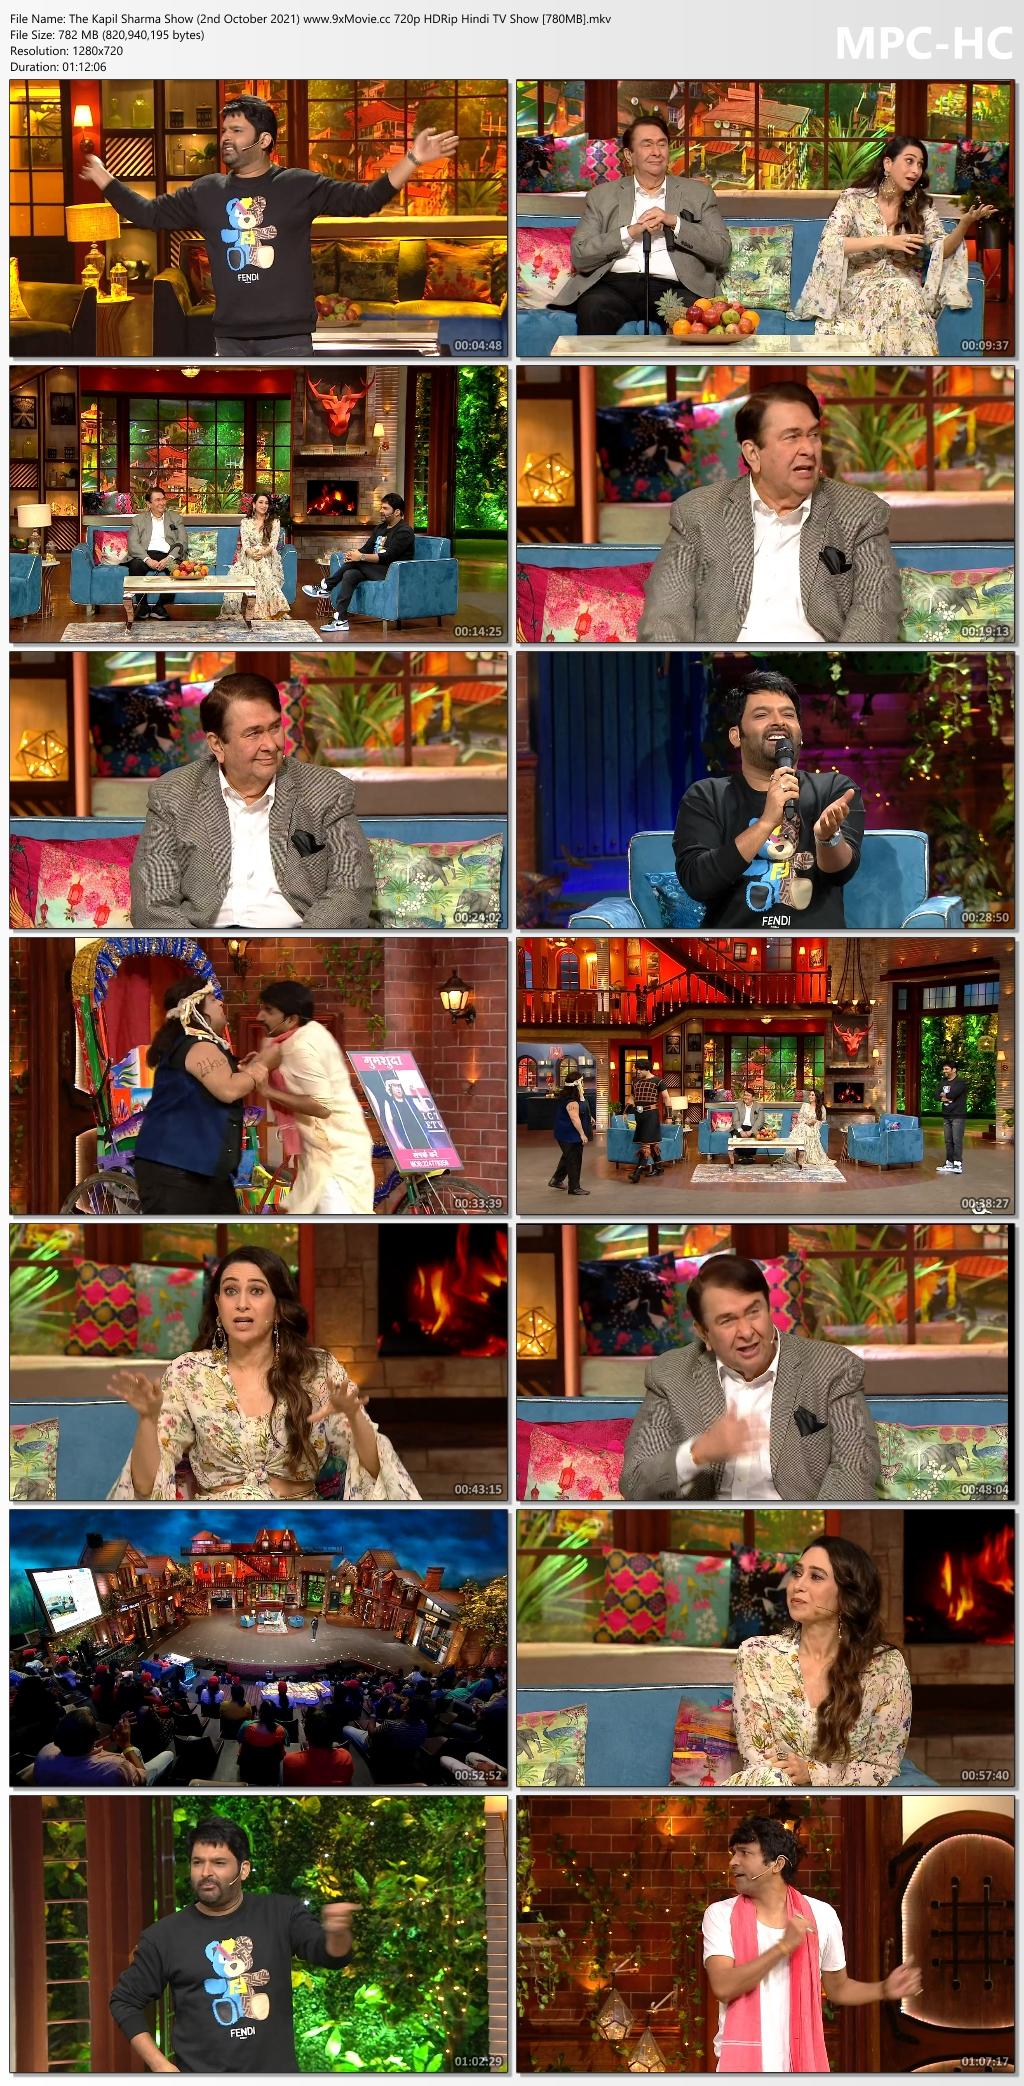 The-Kapil-Sharma-Show-2nd-October-2021-www-9x-Movie-cc-720p-HDRip-Hindi-TV-Show-780-MB-mkv